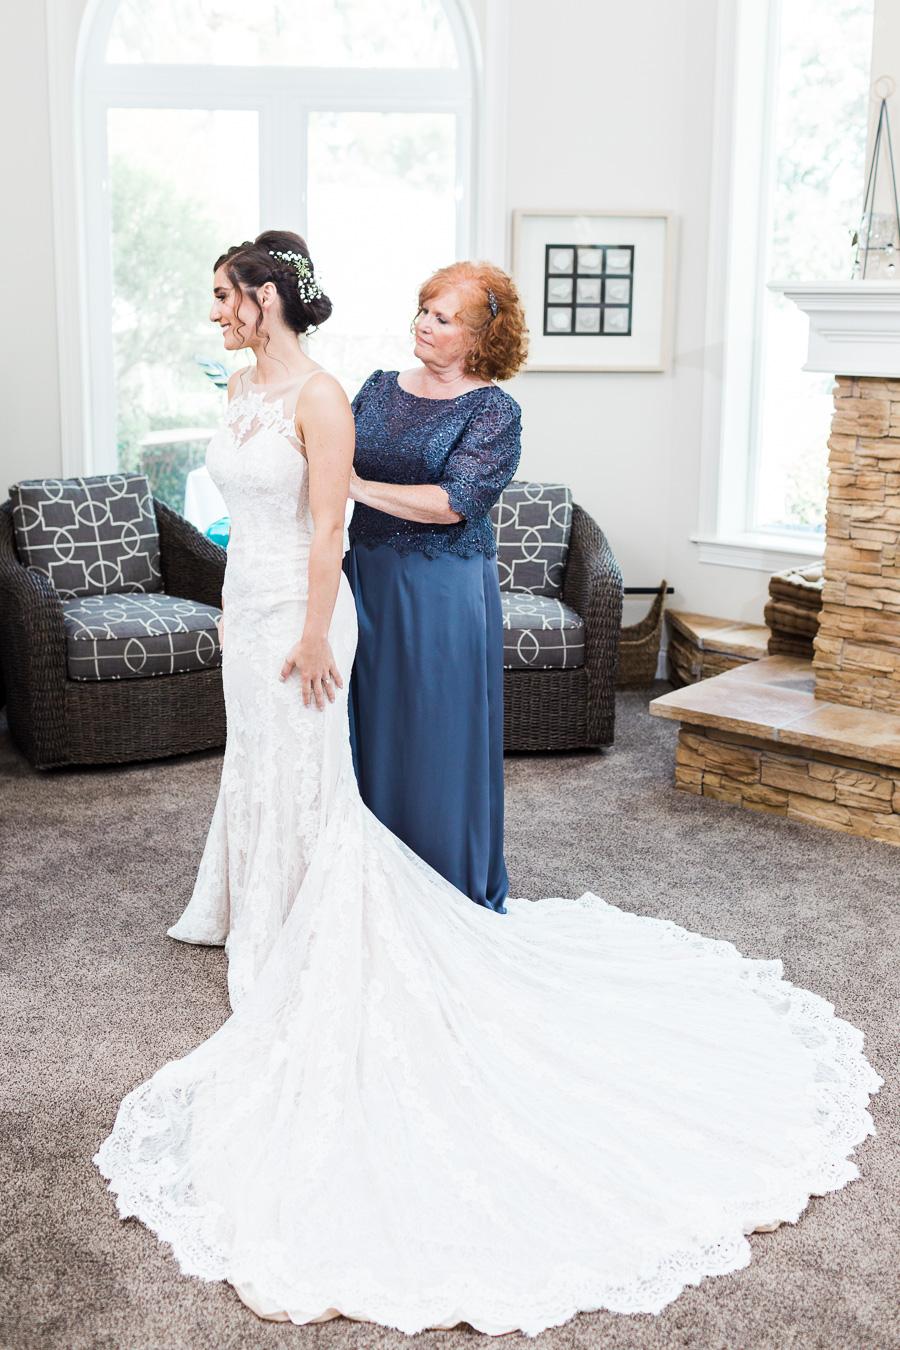 Wedding-photographer-orlando-23.jpg